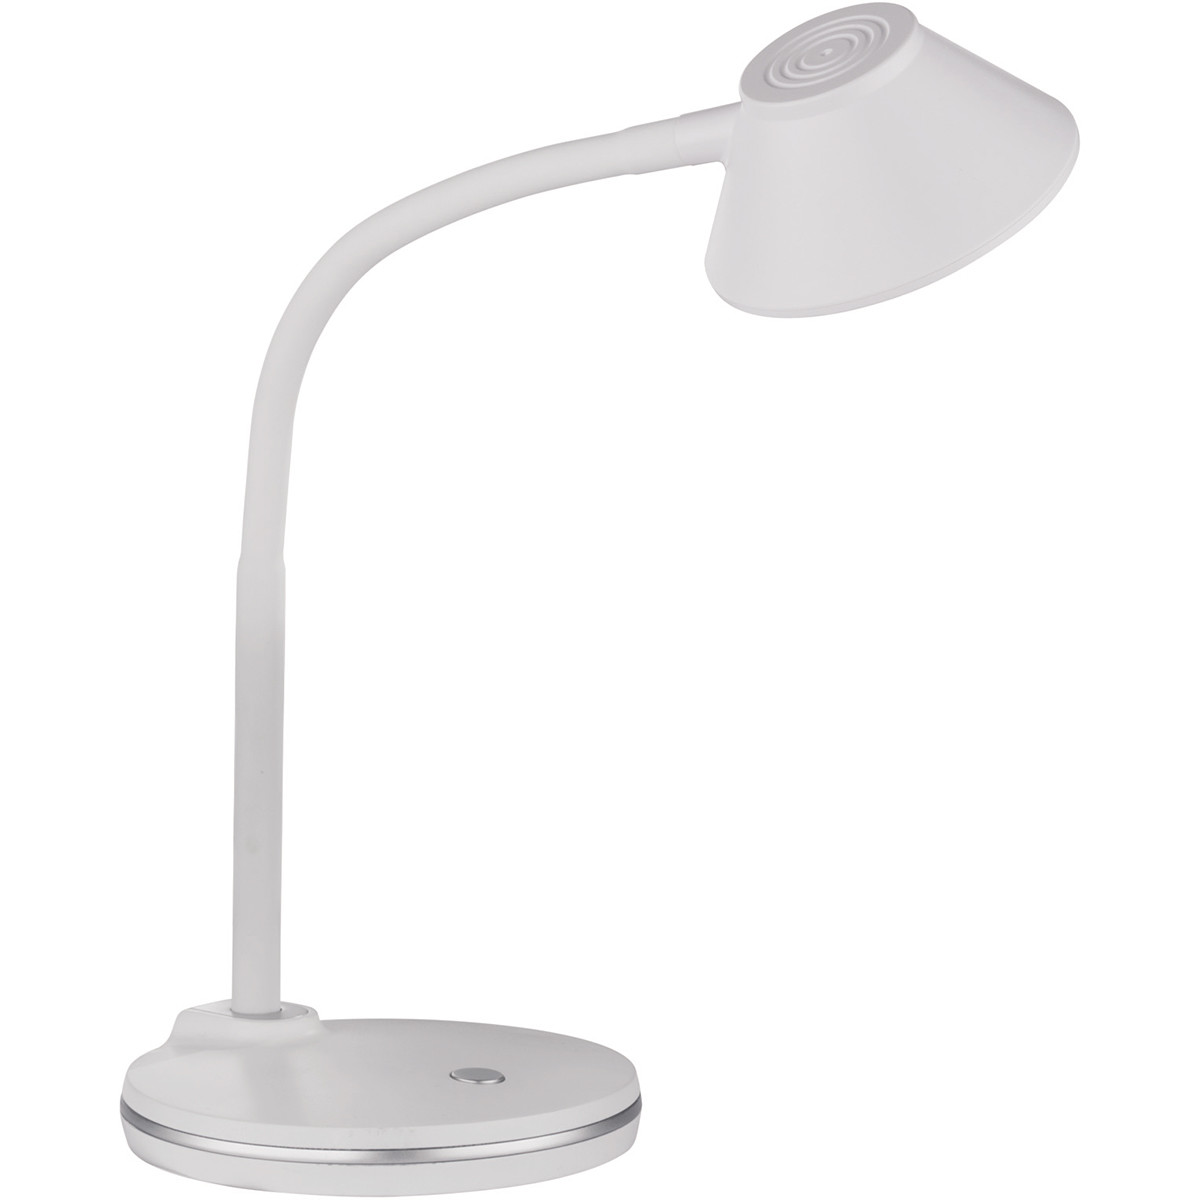 LED Tafellamp - Trion Berony - 3W - Warm Wit 3000K - Rond - Flexibele Arm - Mat